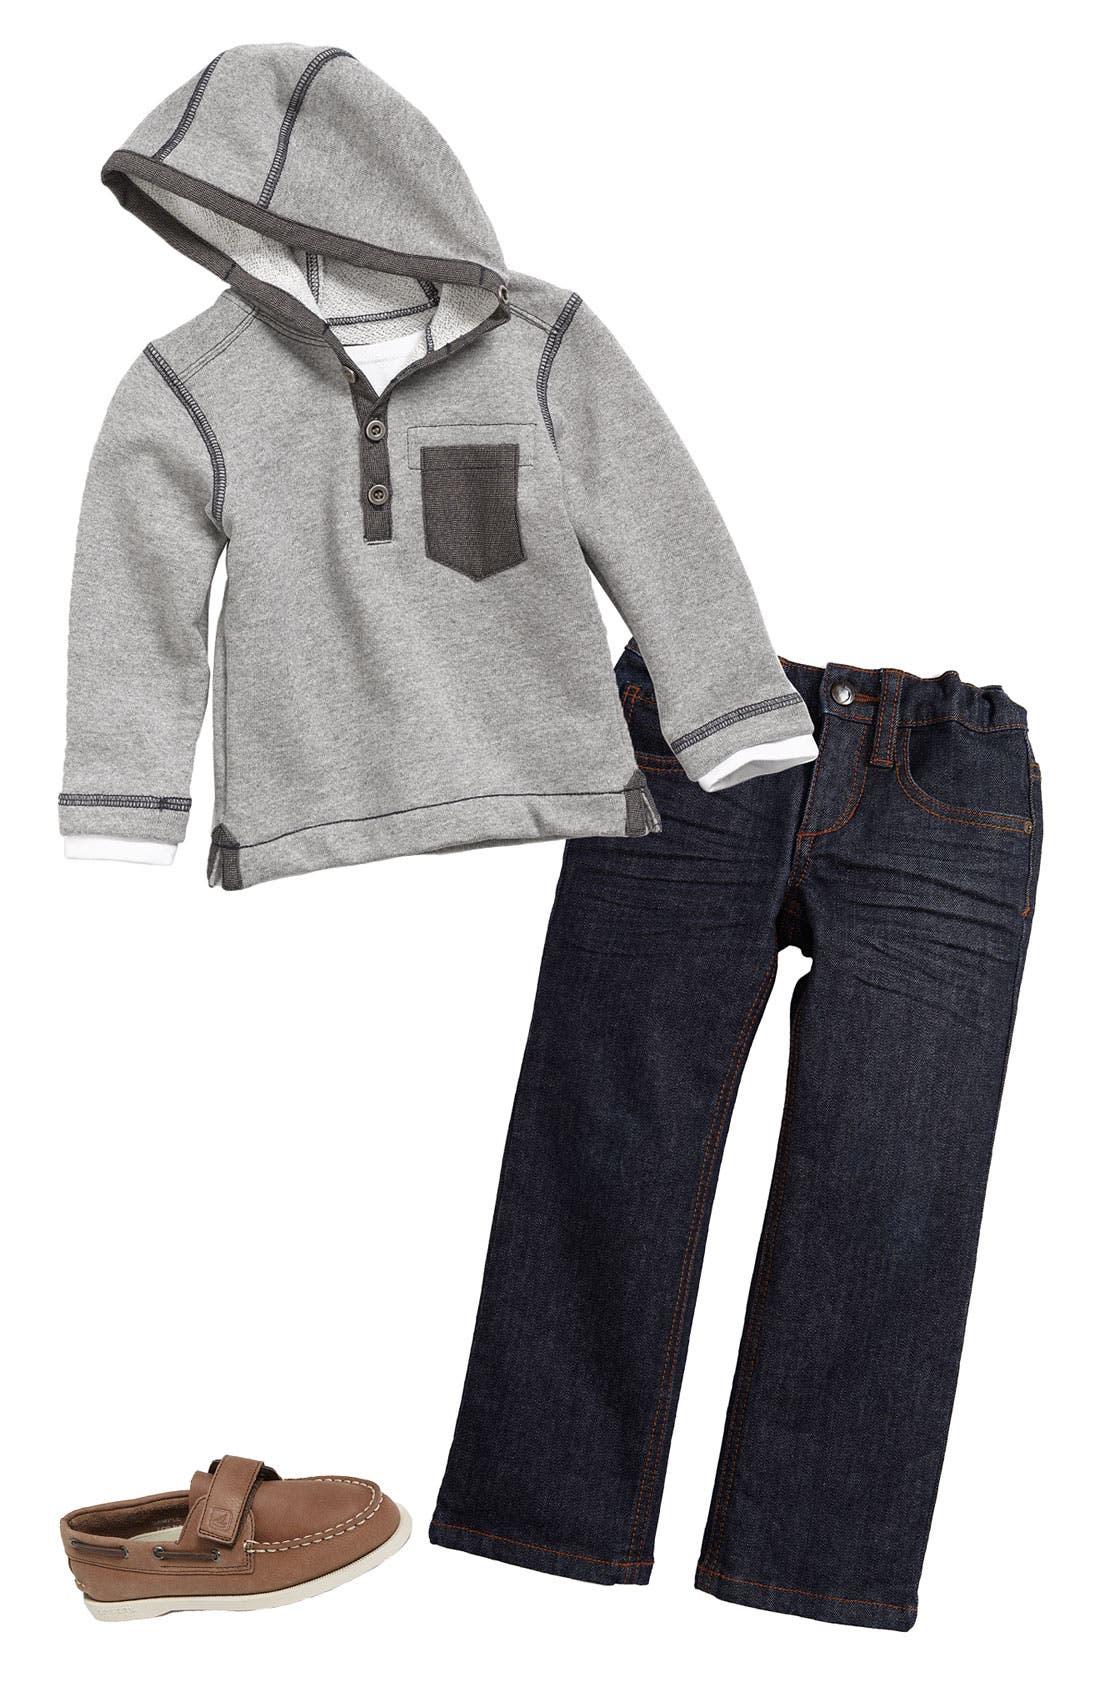 Main Image - Sovereign Code Hoodie & Joe's Skinny Jeans (Toddler)